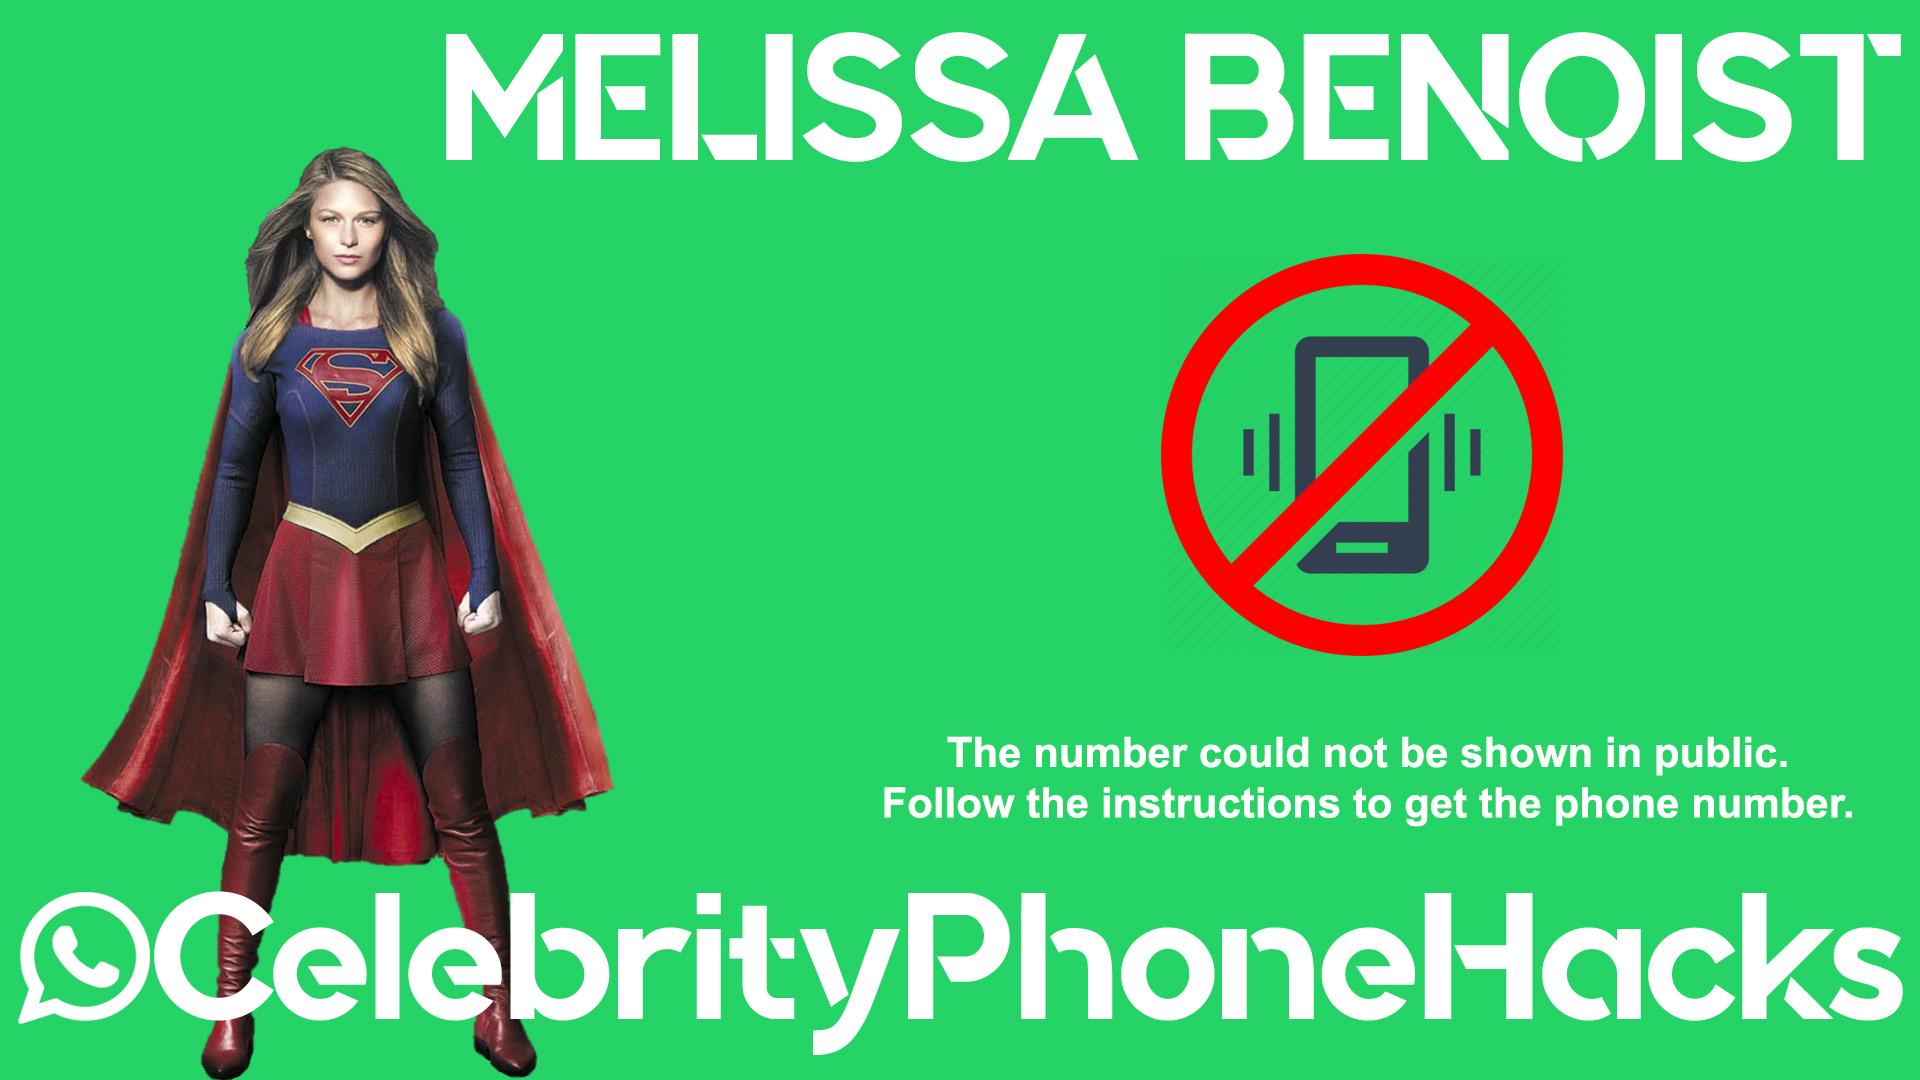 Melissa Benoist real phone number 2019 whatsapp hacked leaked